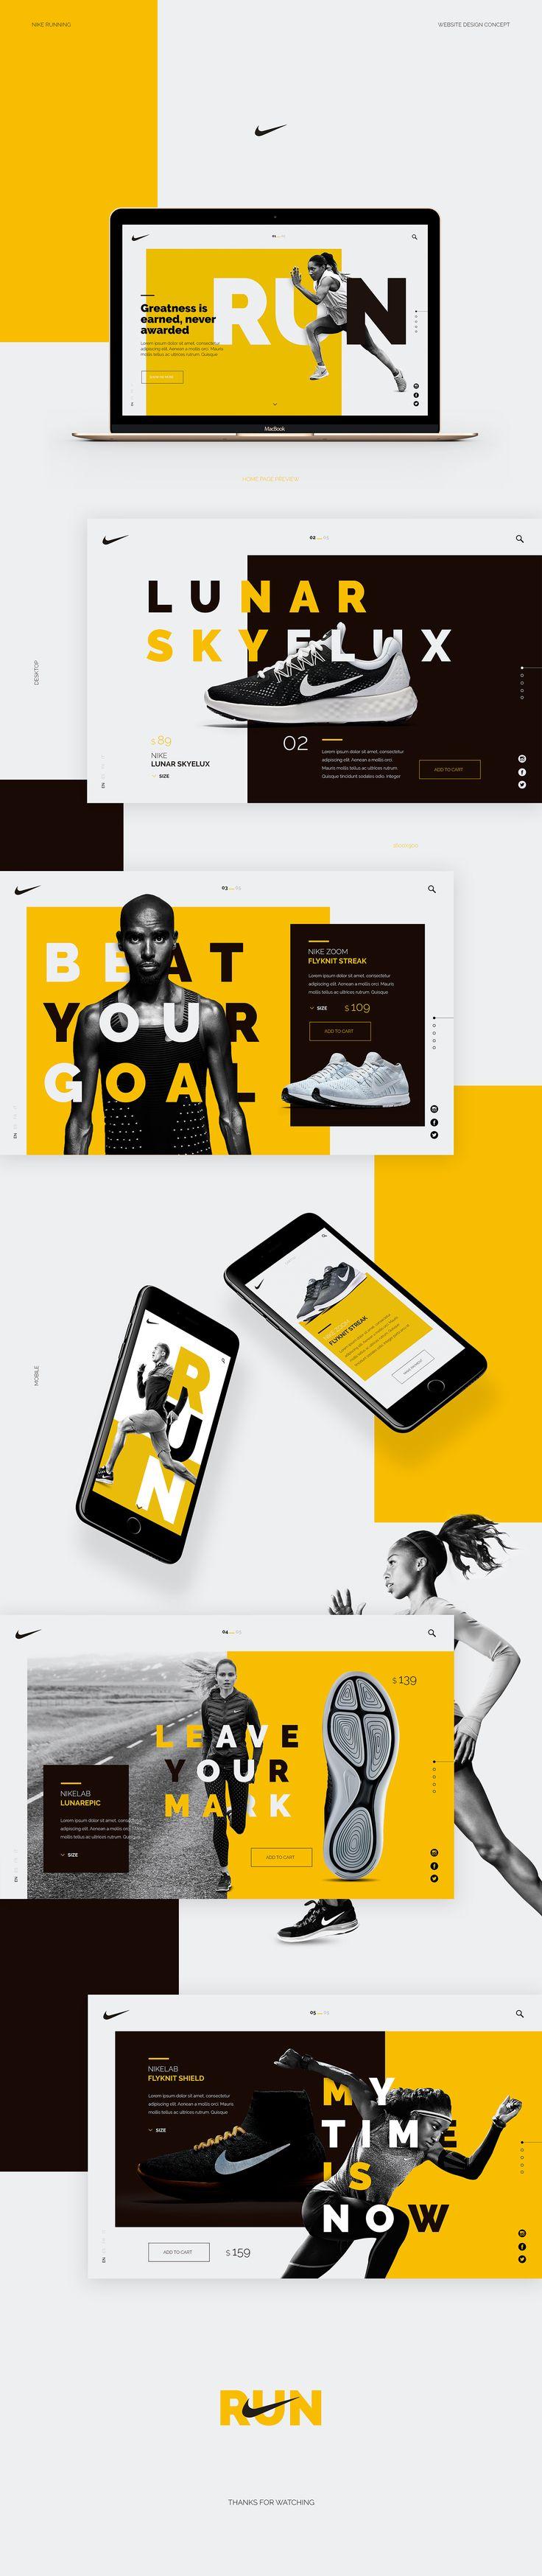 Nike Running web design concept https://twitter.com/faefmgianm/status/895095114724327424